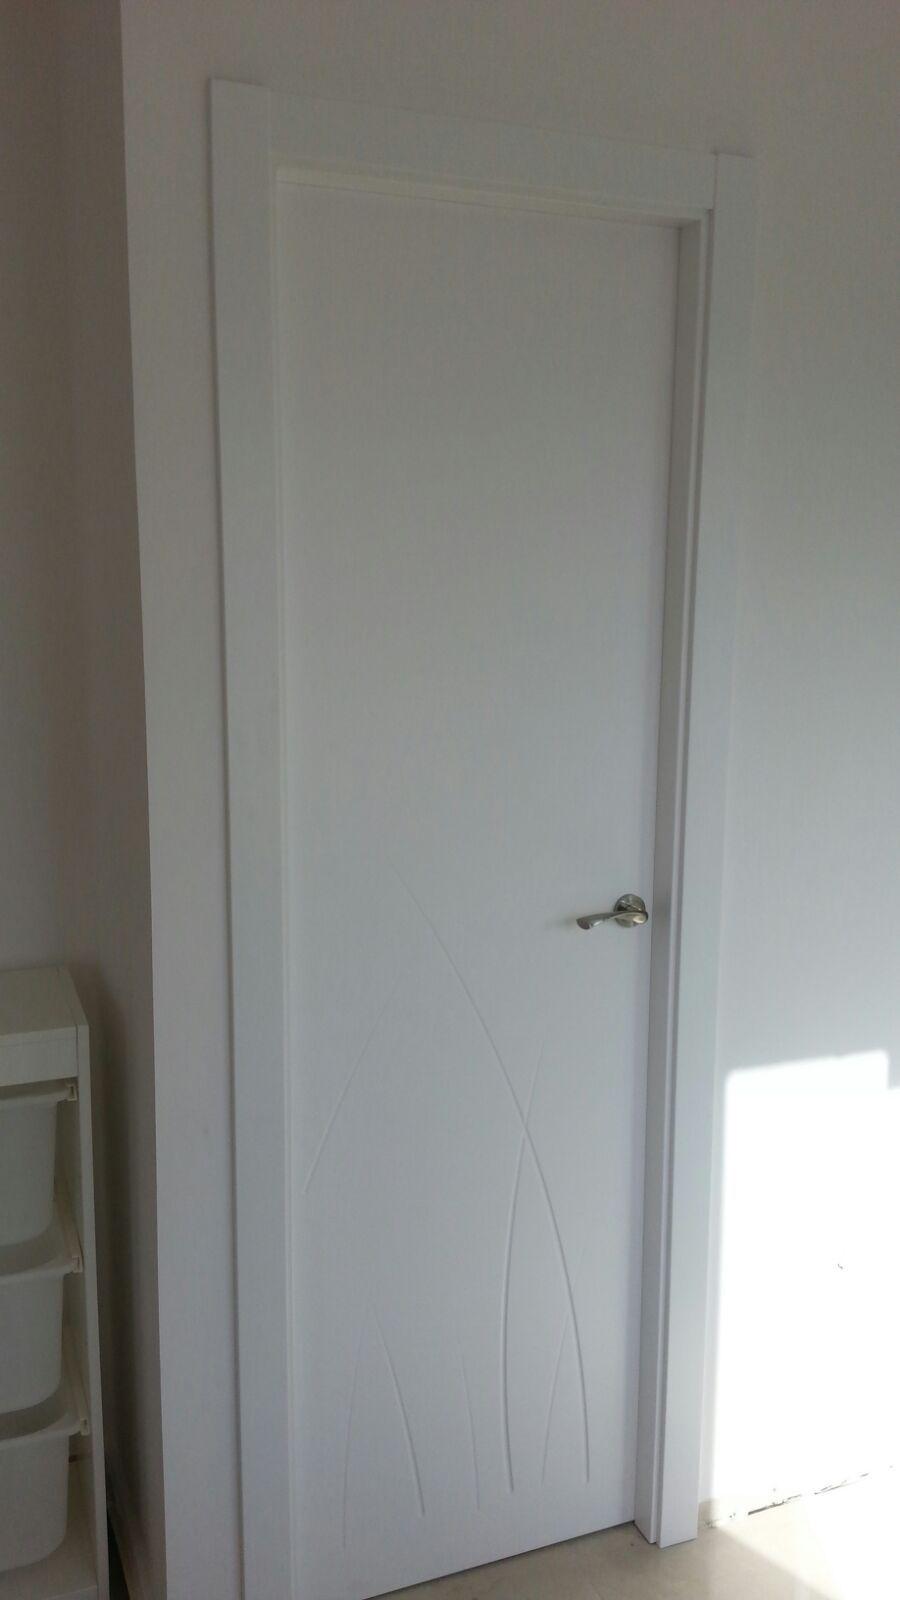 Original dise o puerta lacada en blanco modelo 981 puertas lacadas en blanco - Puertas de madera en sevilla ...